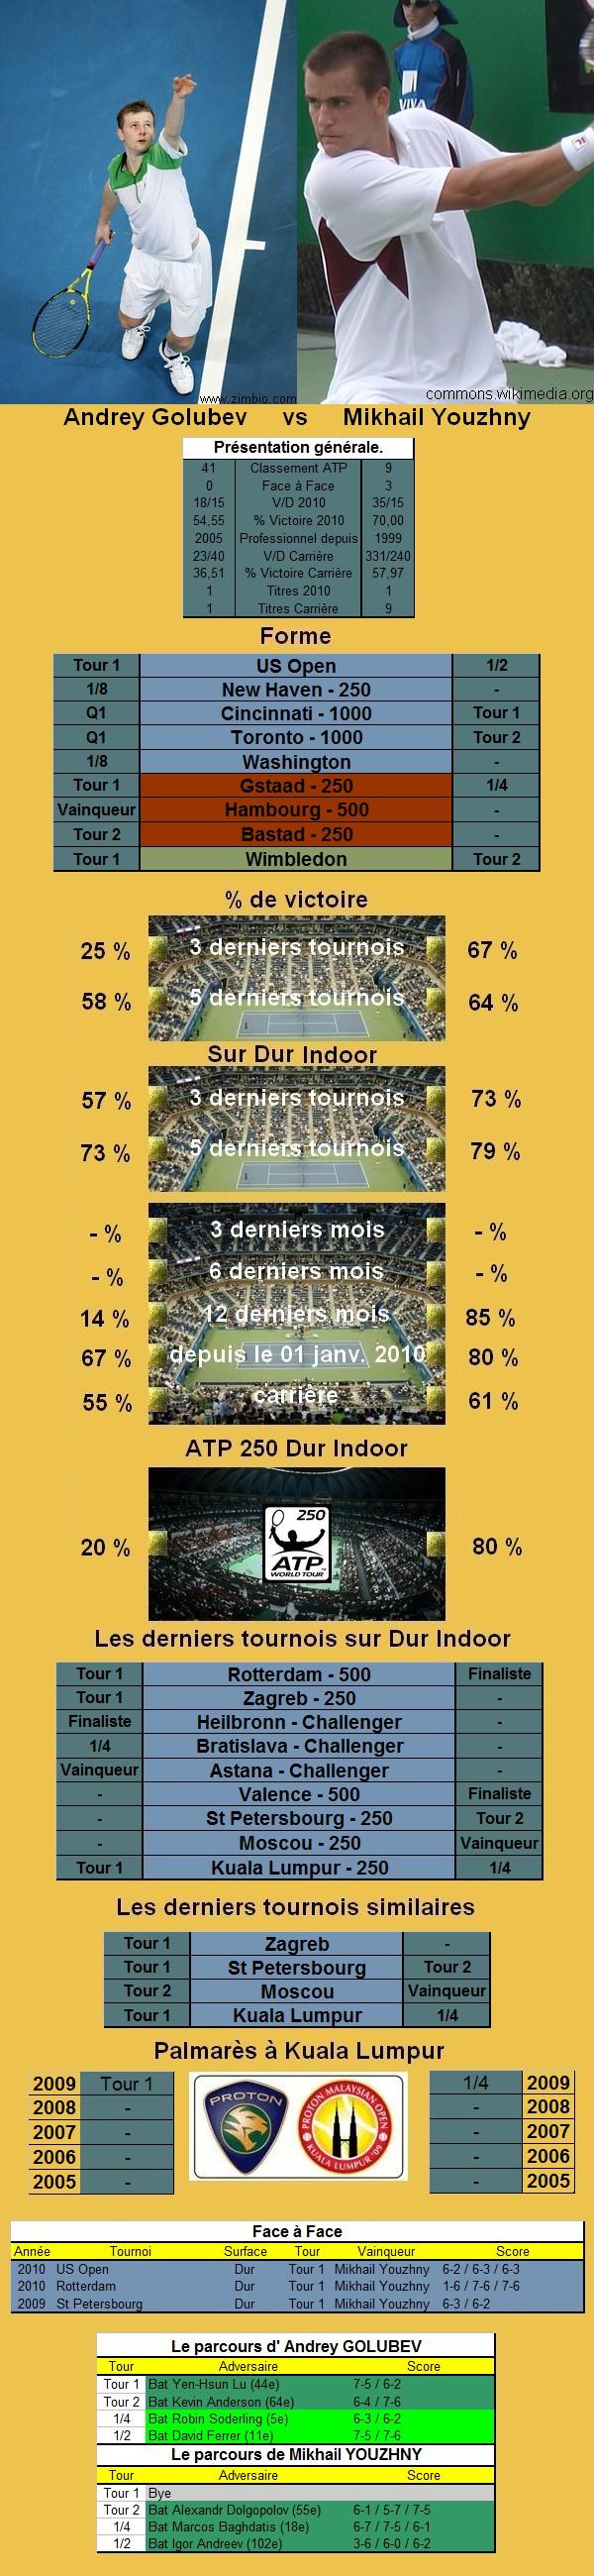 Statistiques tennis de Golubev contre Youzhny à Kuala Lumpur